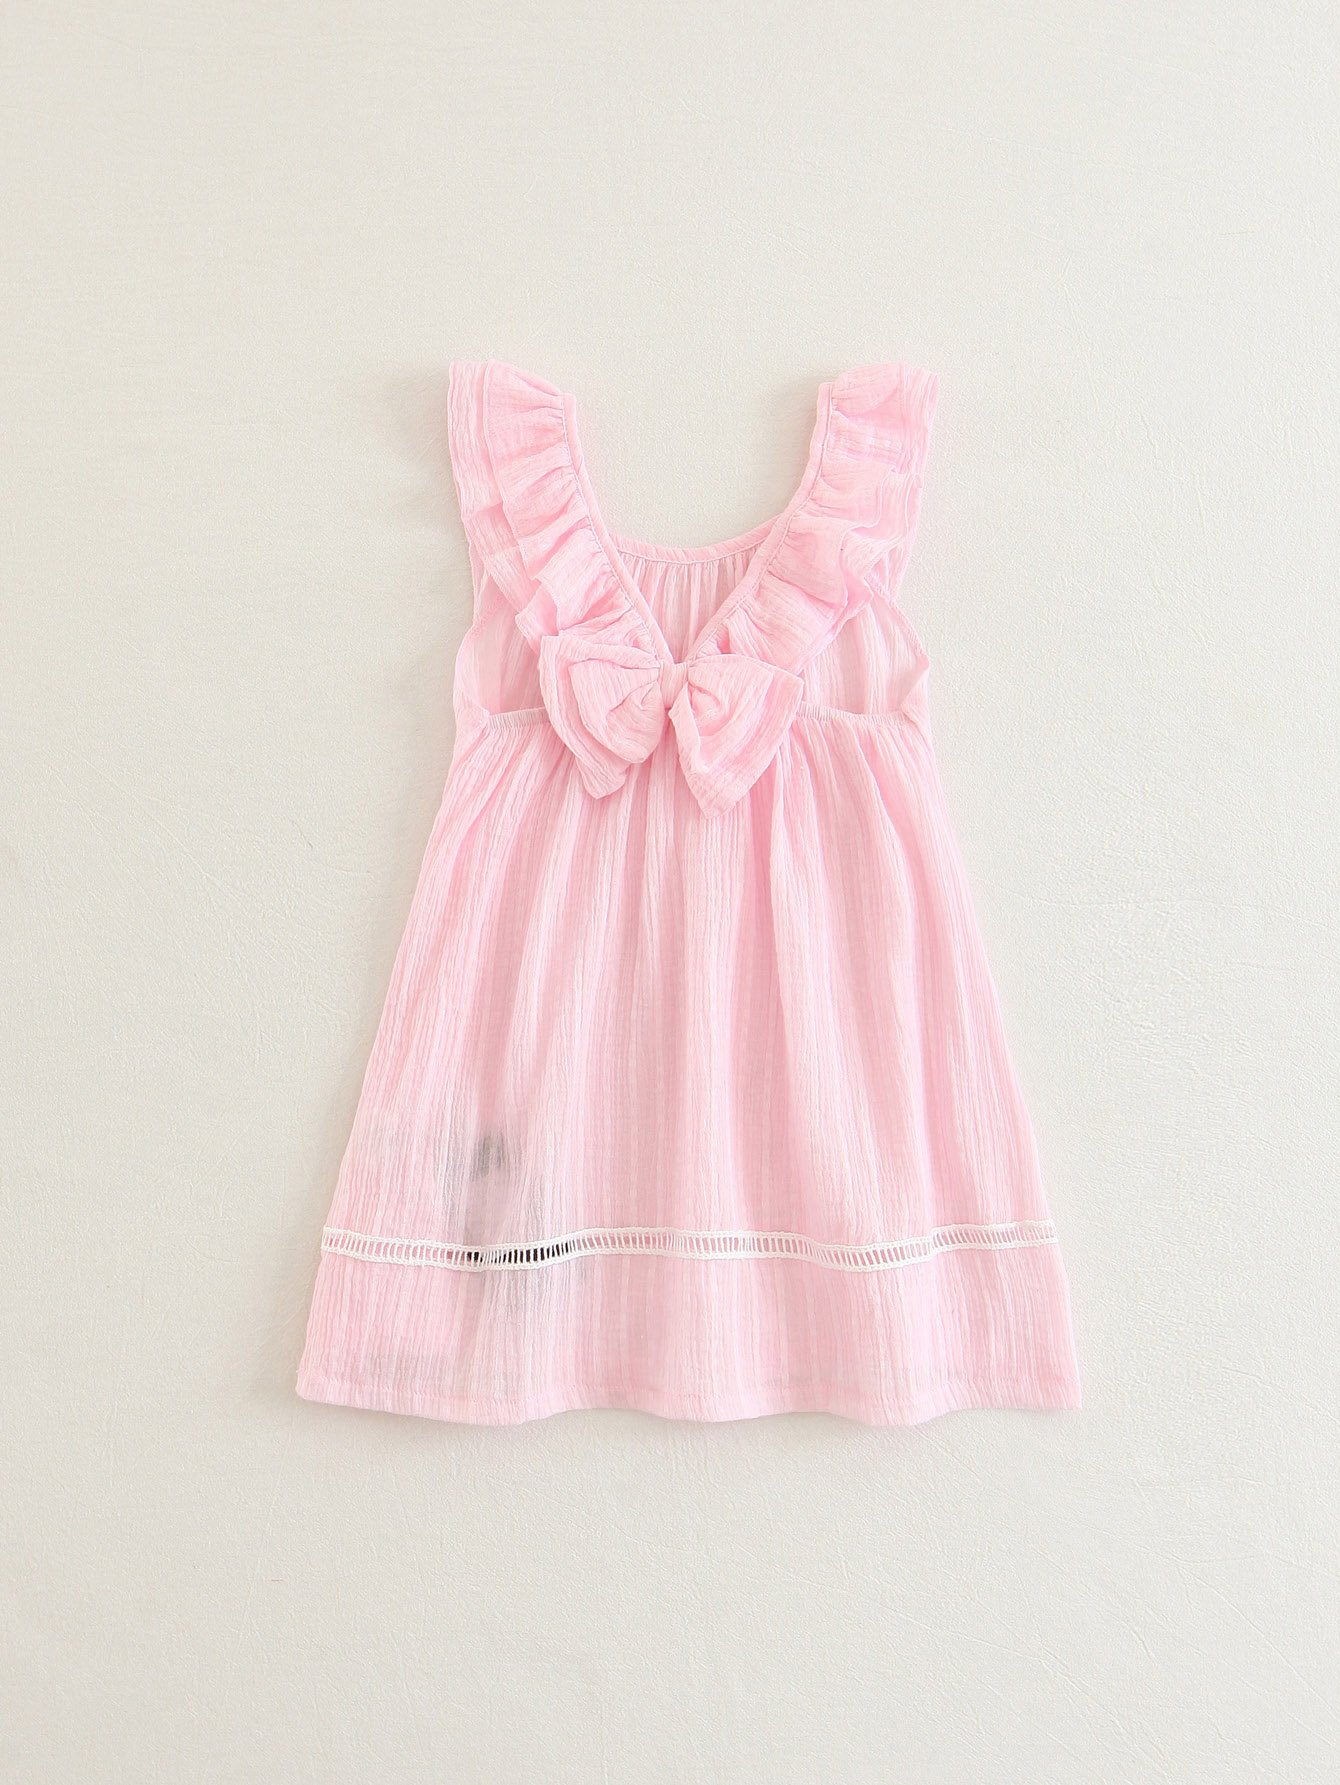 Girls Lace Panel Bow Back Ruffle Dress коммутатор tp link tl sf1016 неуправляемый настольный 19u 16x10 100base tx